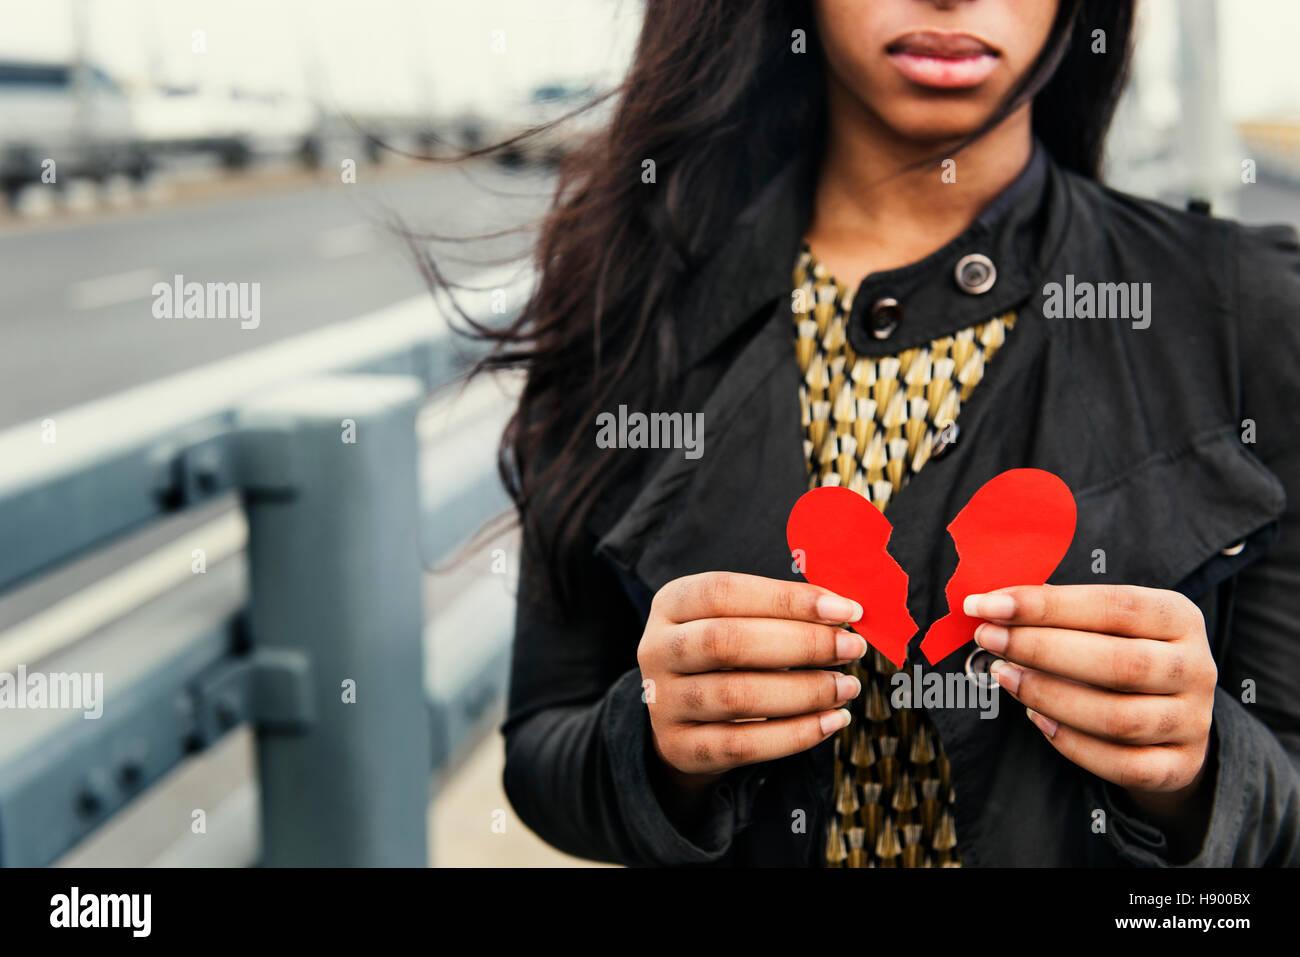 Afrikanische Frau gebrochen Herzen enttäuscht traurig Konzept Stockbild